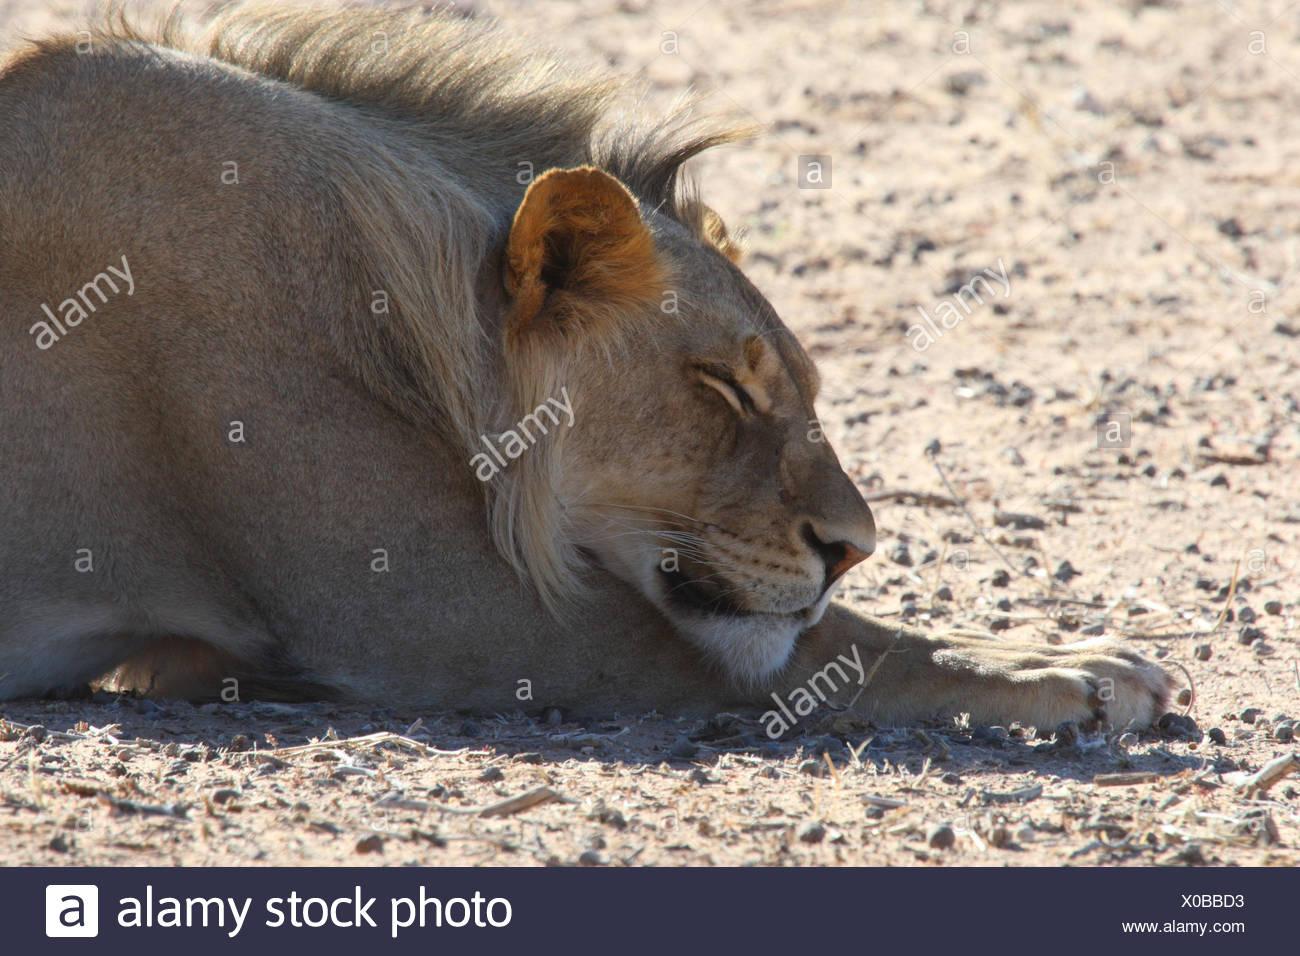 Lion, little man, sleeping, Lion, - Stock Image